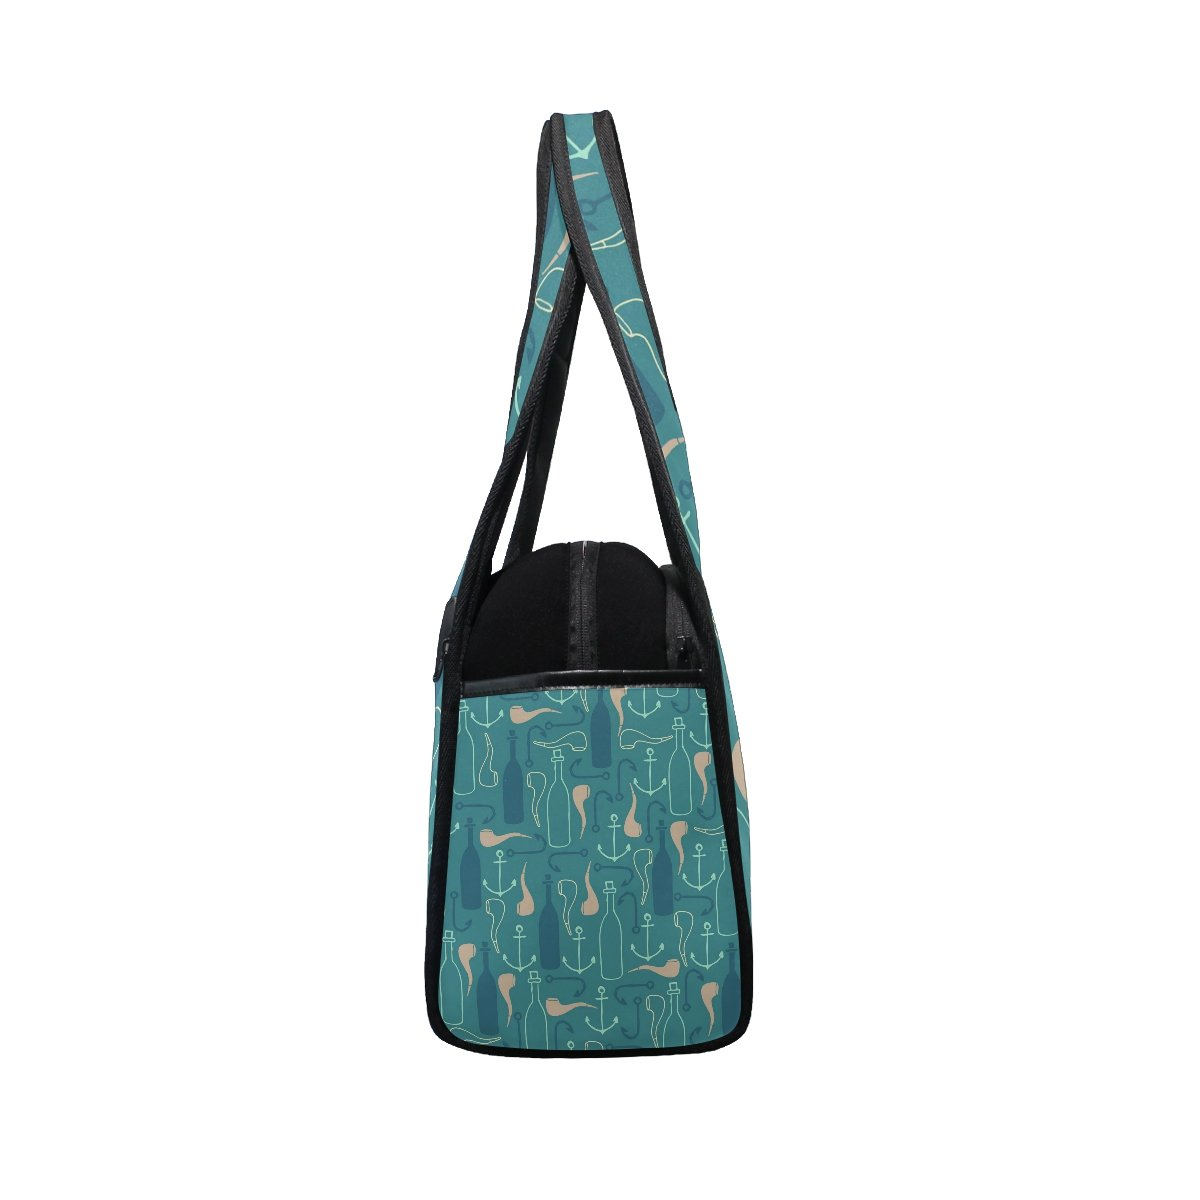 Sport Gym Bag Anchor Pipe Pattern Canvas Travel Duffel Bag